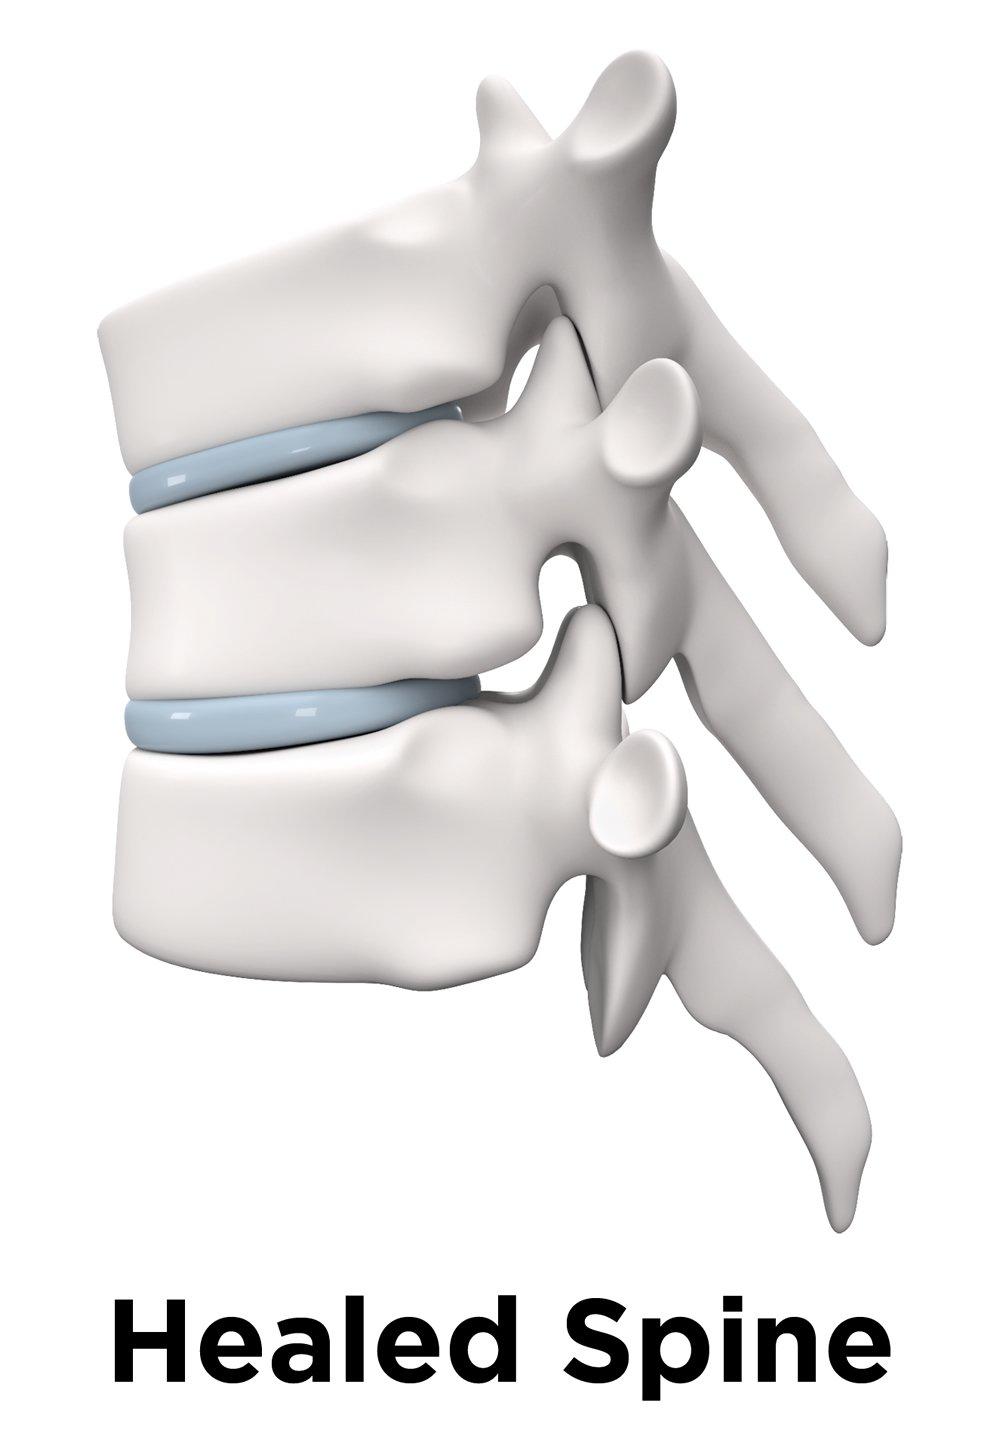 Healed Spine